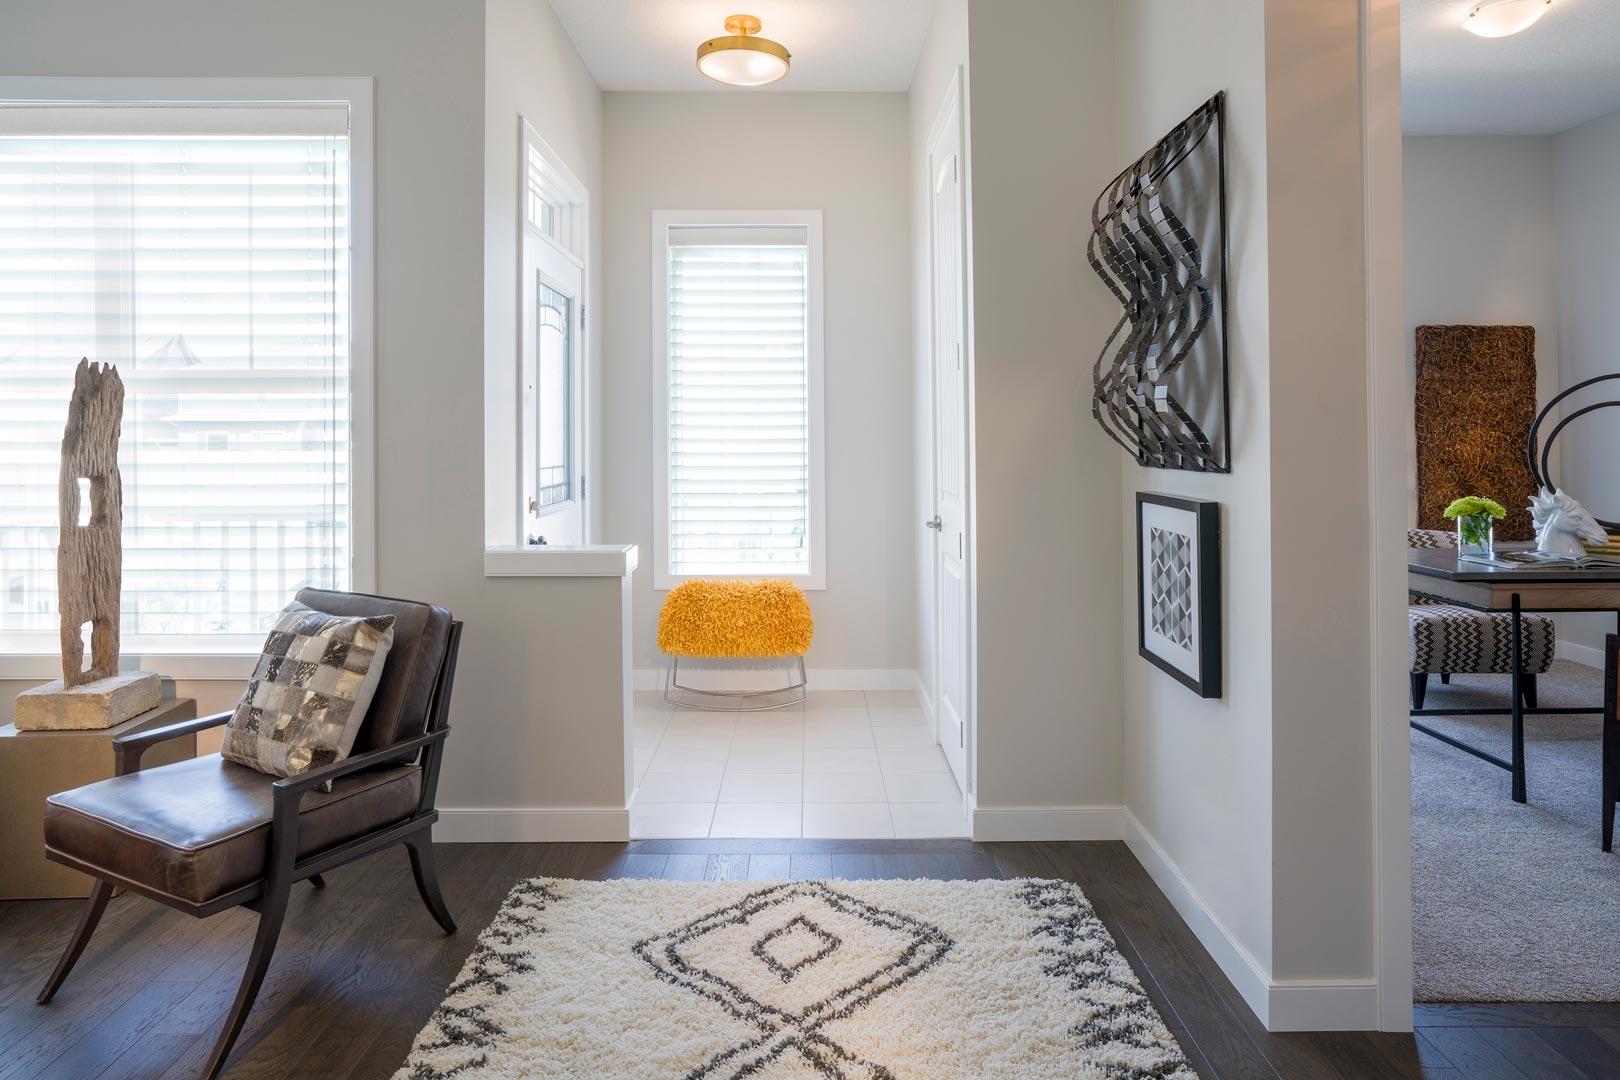 Douglas Homes Interior Image - Entranceway